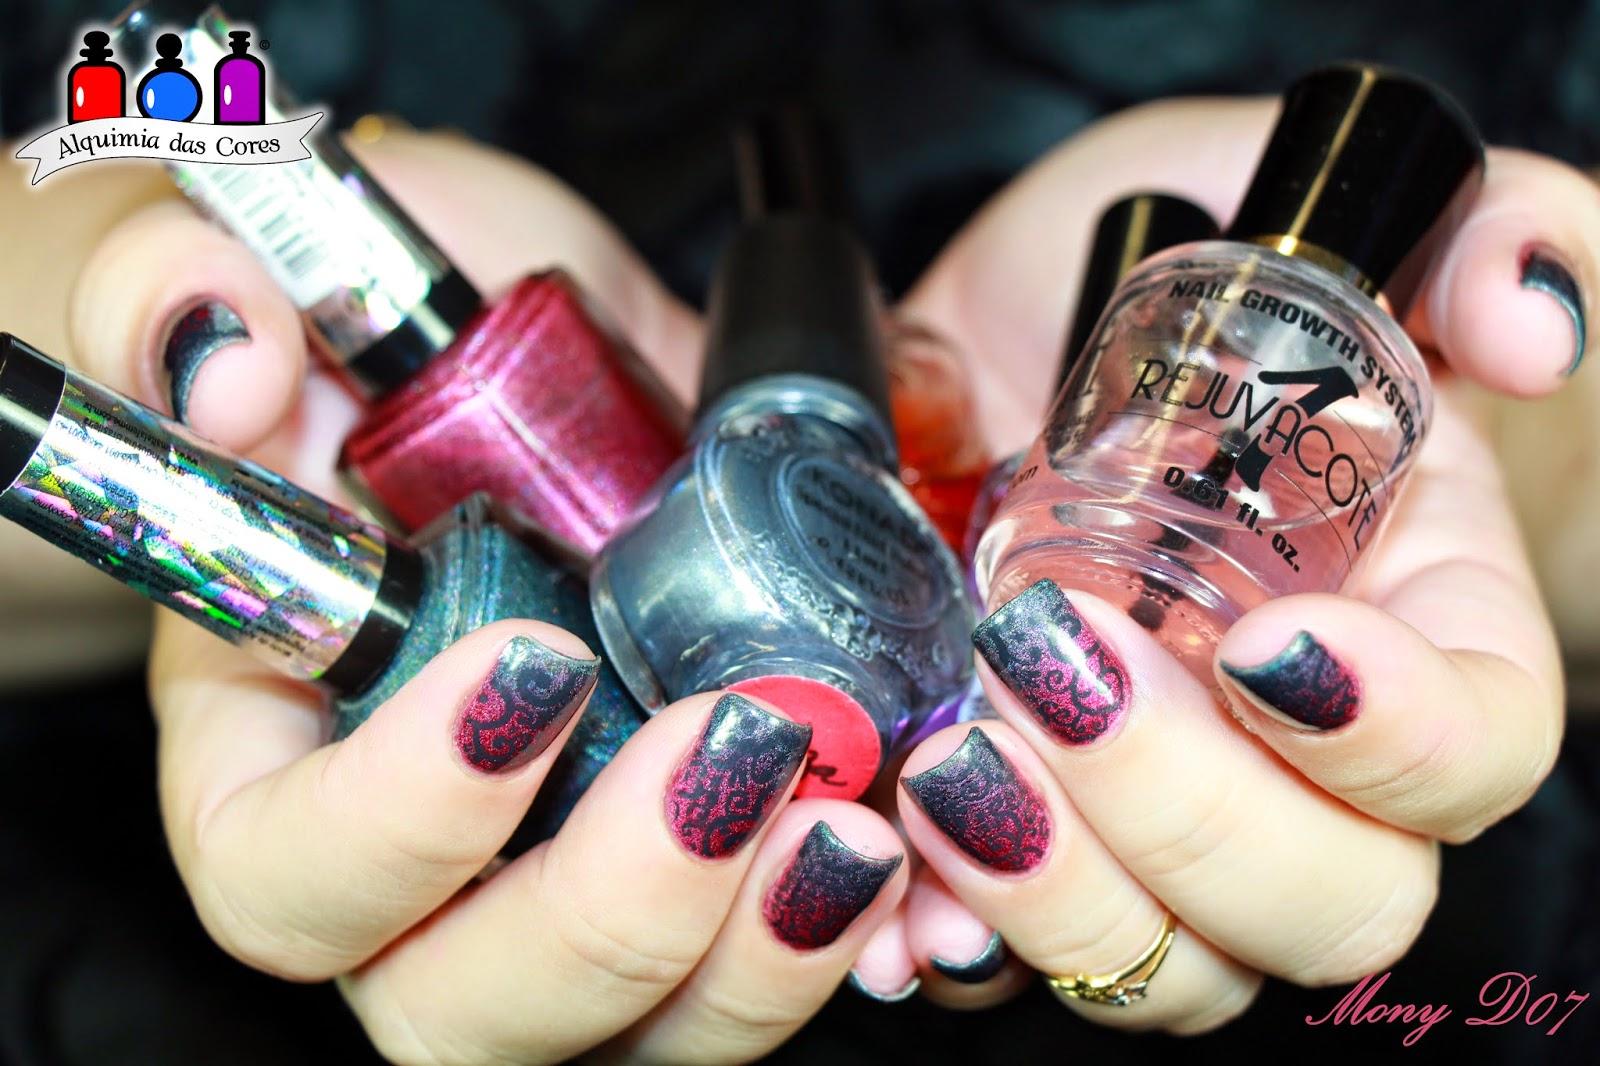 La Femme, Poderosa, Glamorosa, Holográfico, Grafite, Magenta, Konad, HêHê, carimbada, Degrade, nail art, Gradient Nail, Mony D07, Simone D07,